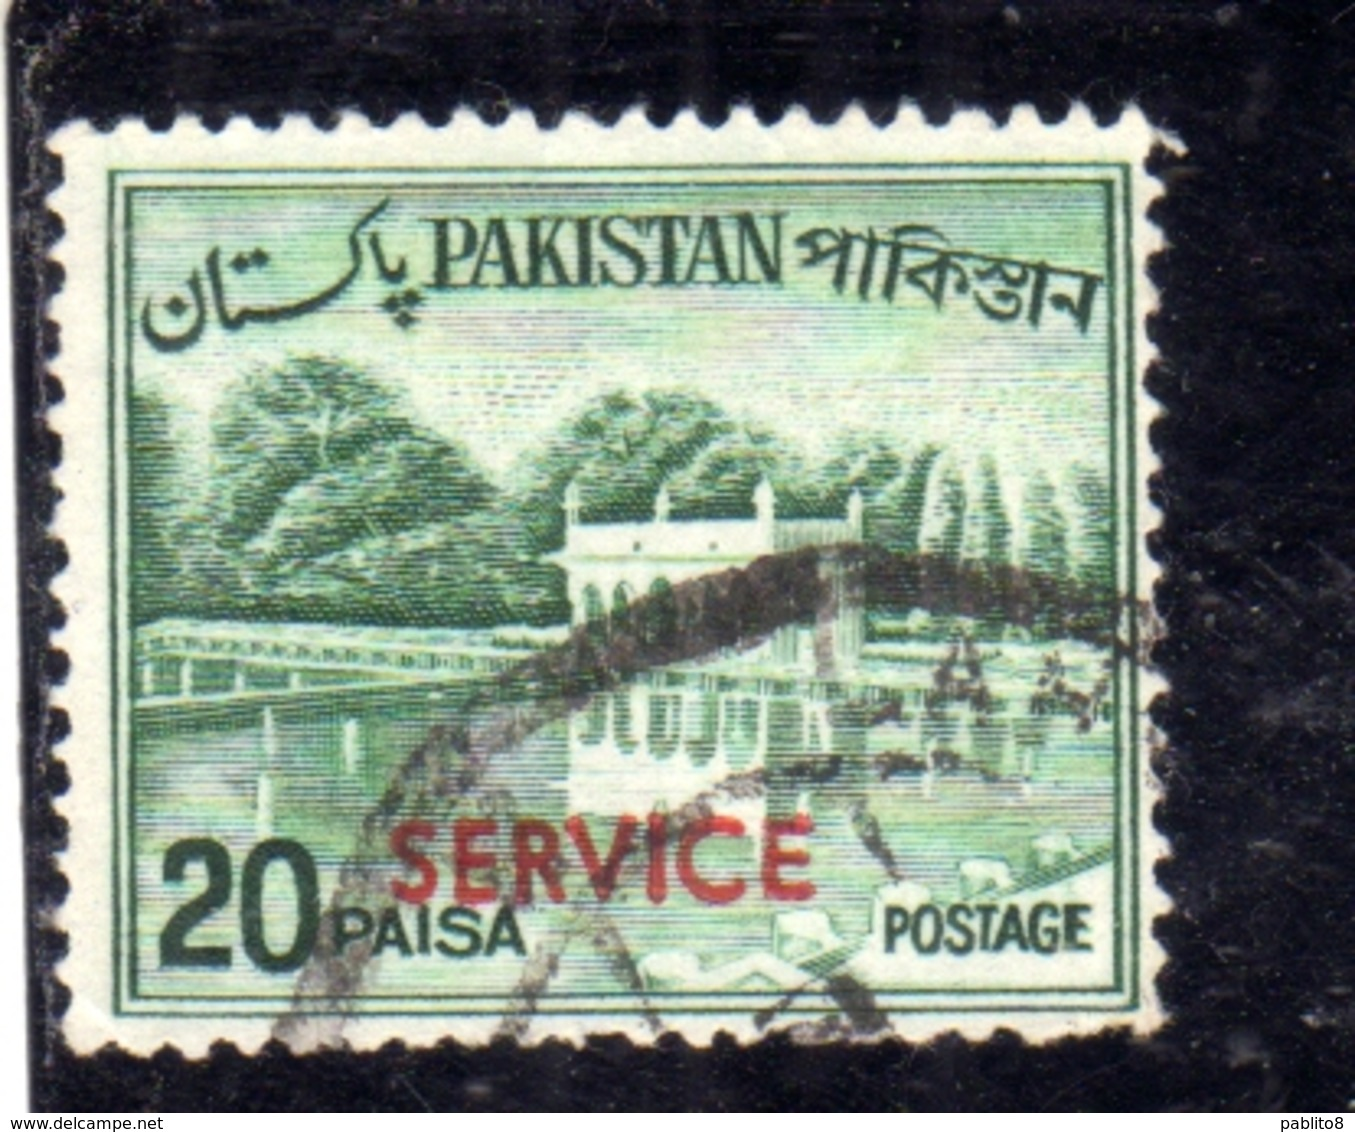 PAKISTAN 1961 1978 OFFICAL STAMPS LANDSCAPE SHALIMAR GARDENS LAHORE SERVICE OVERPRINTED 20p USED USATO OBLITERE - Pakistan